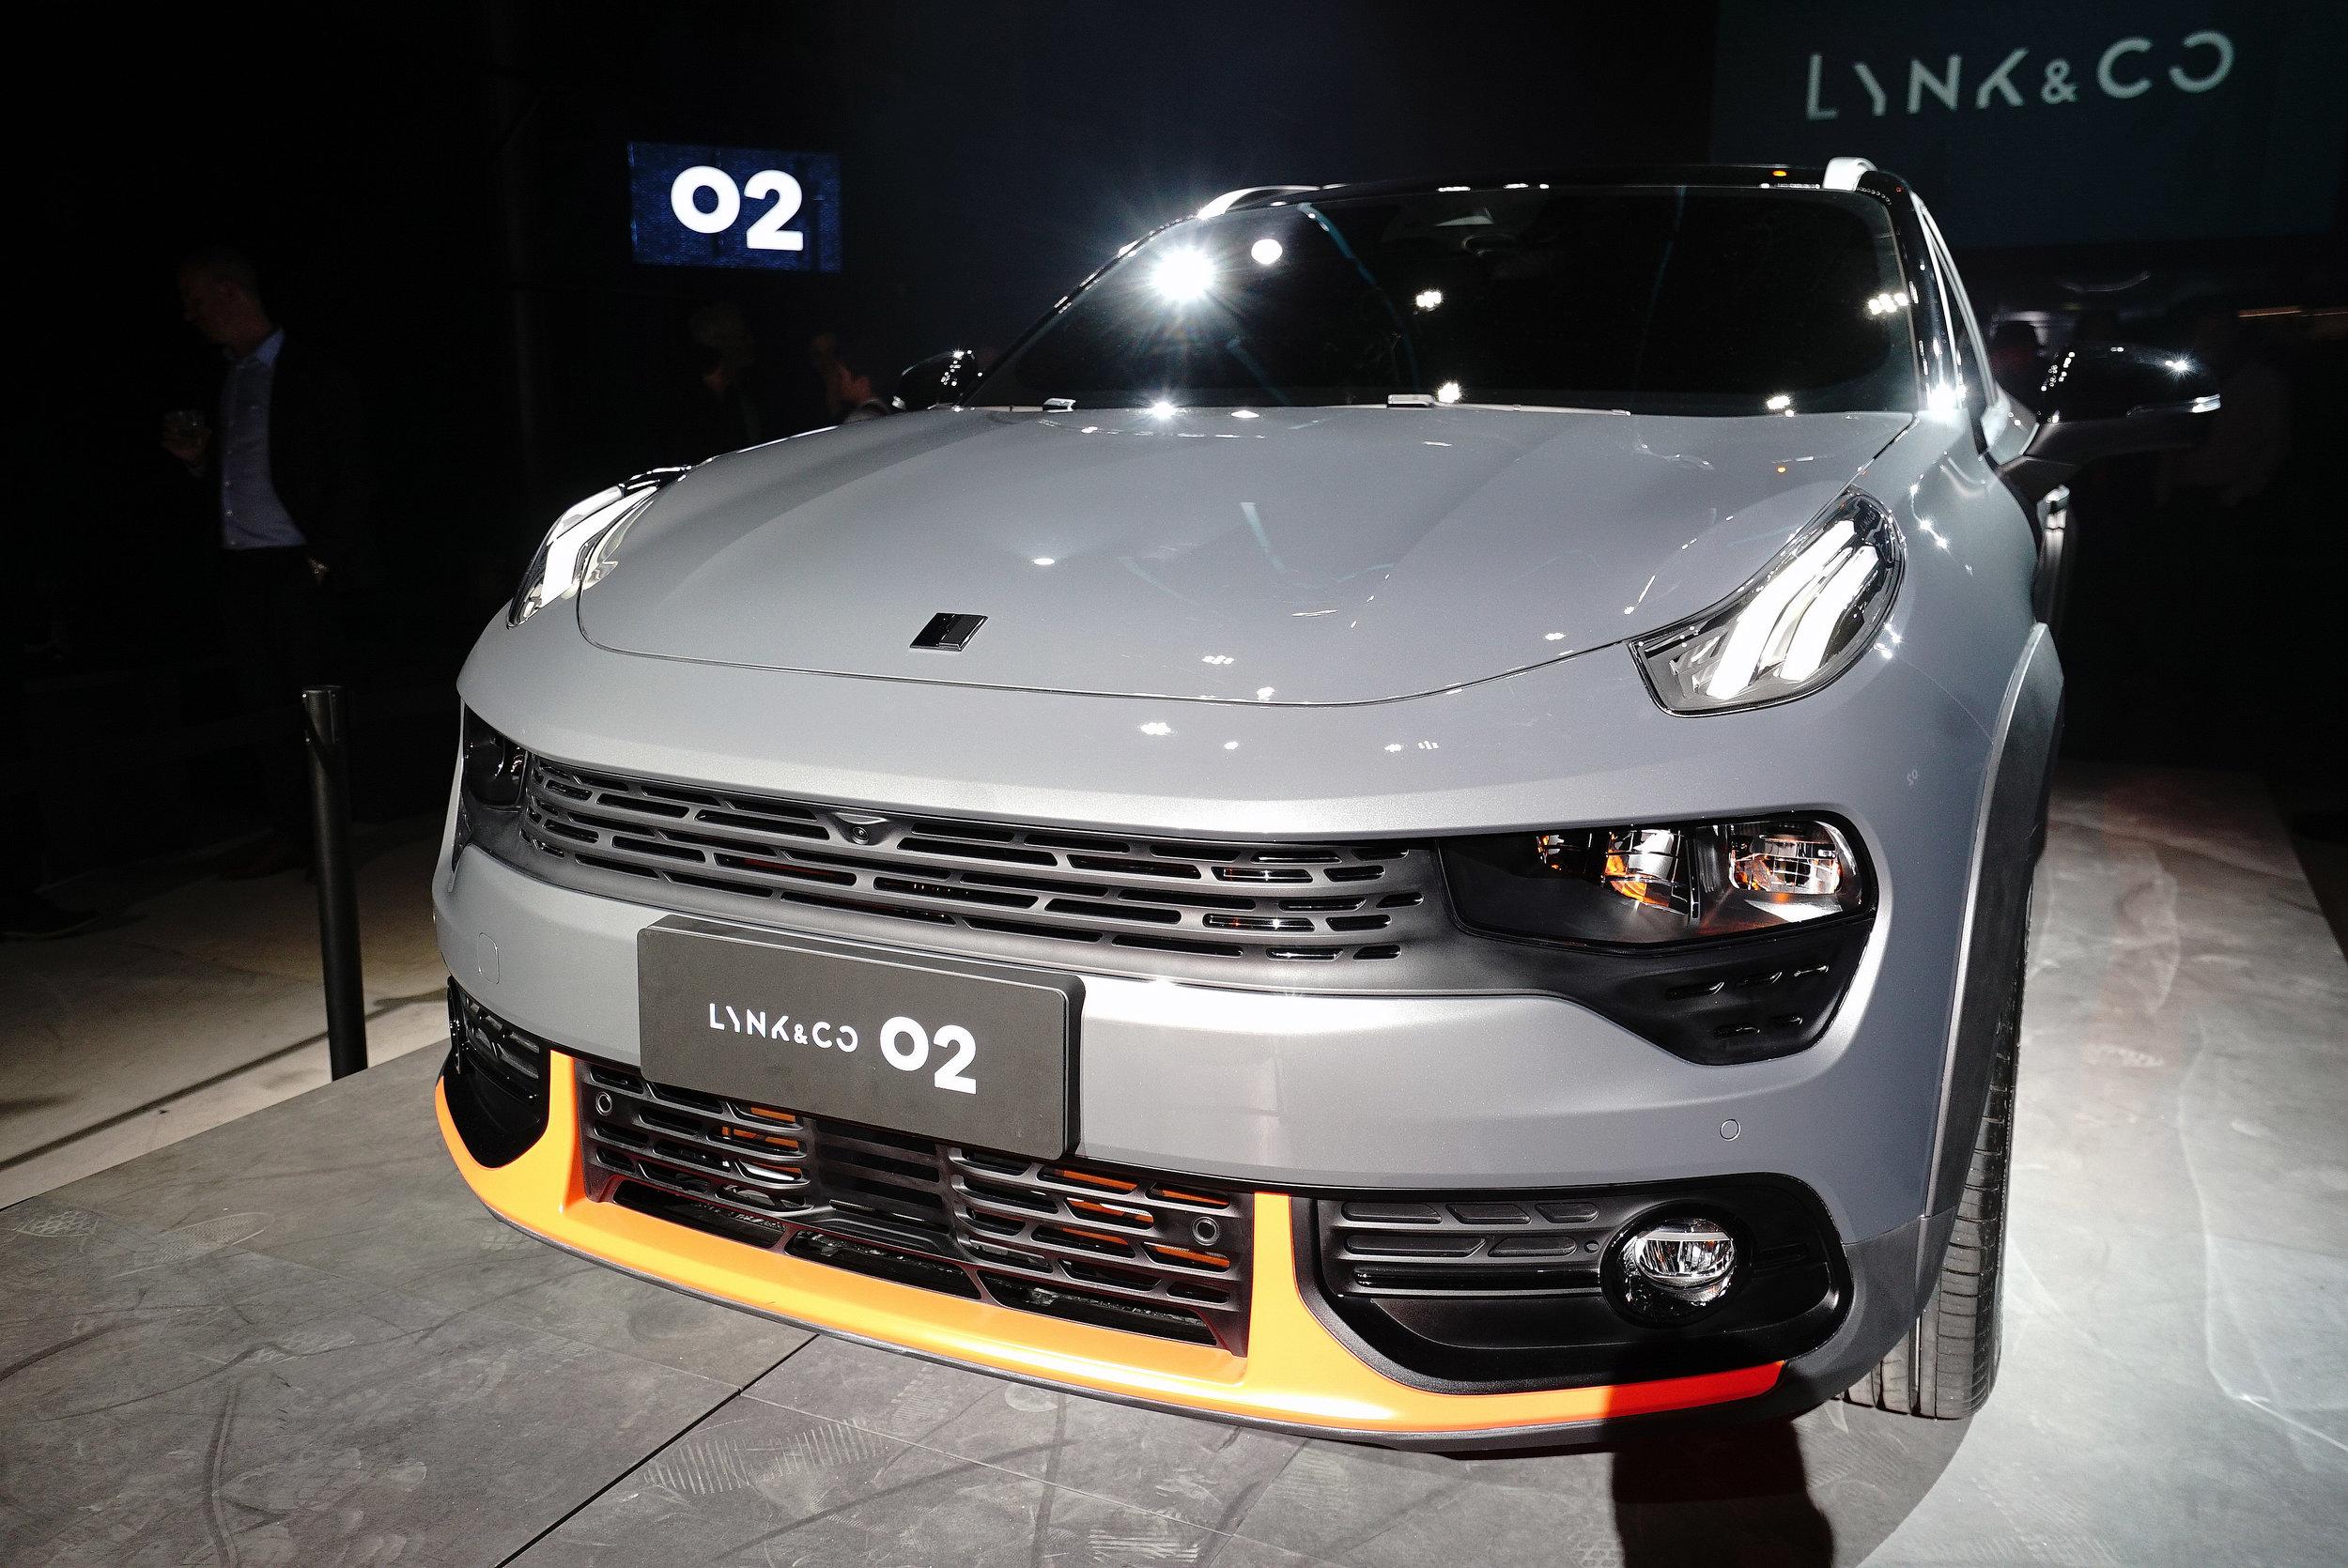 Lynk & Co 02 SUV Launch 9.jpg